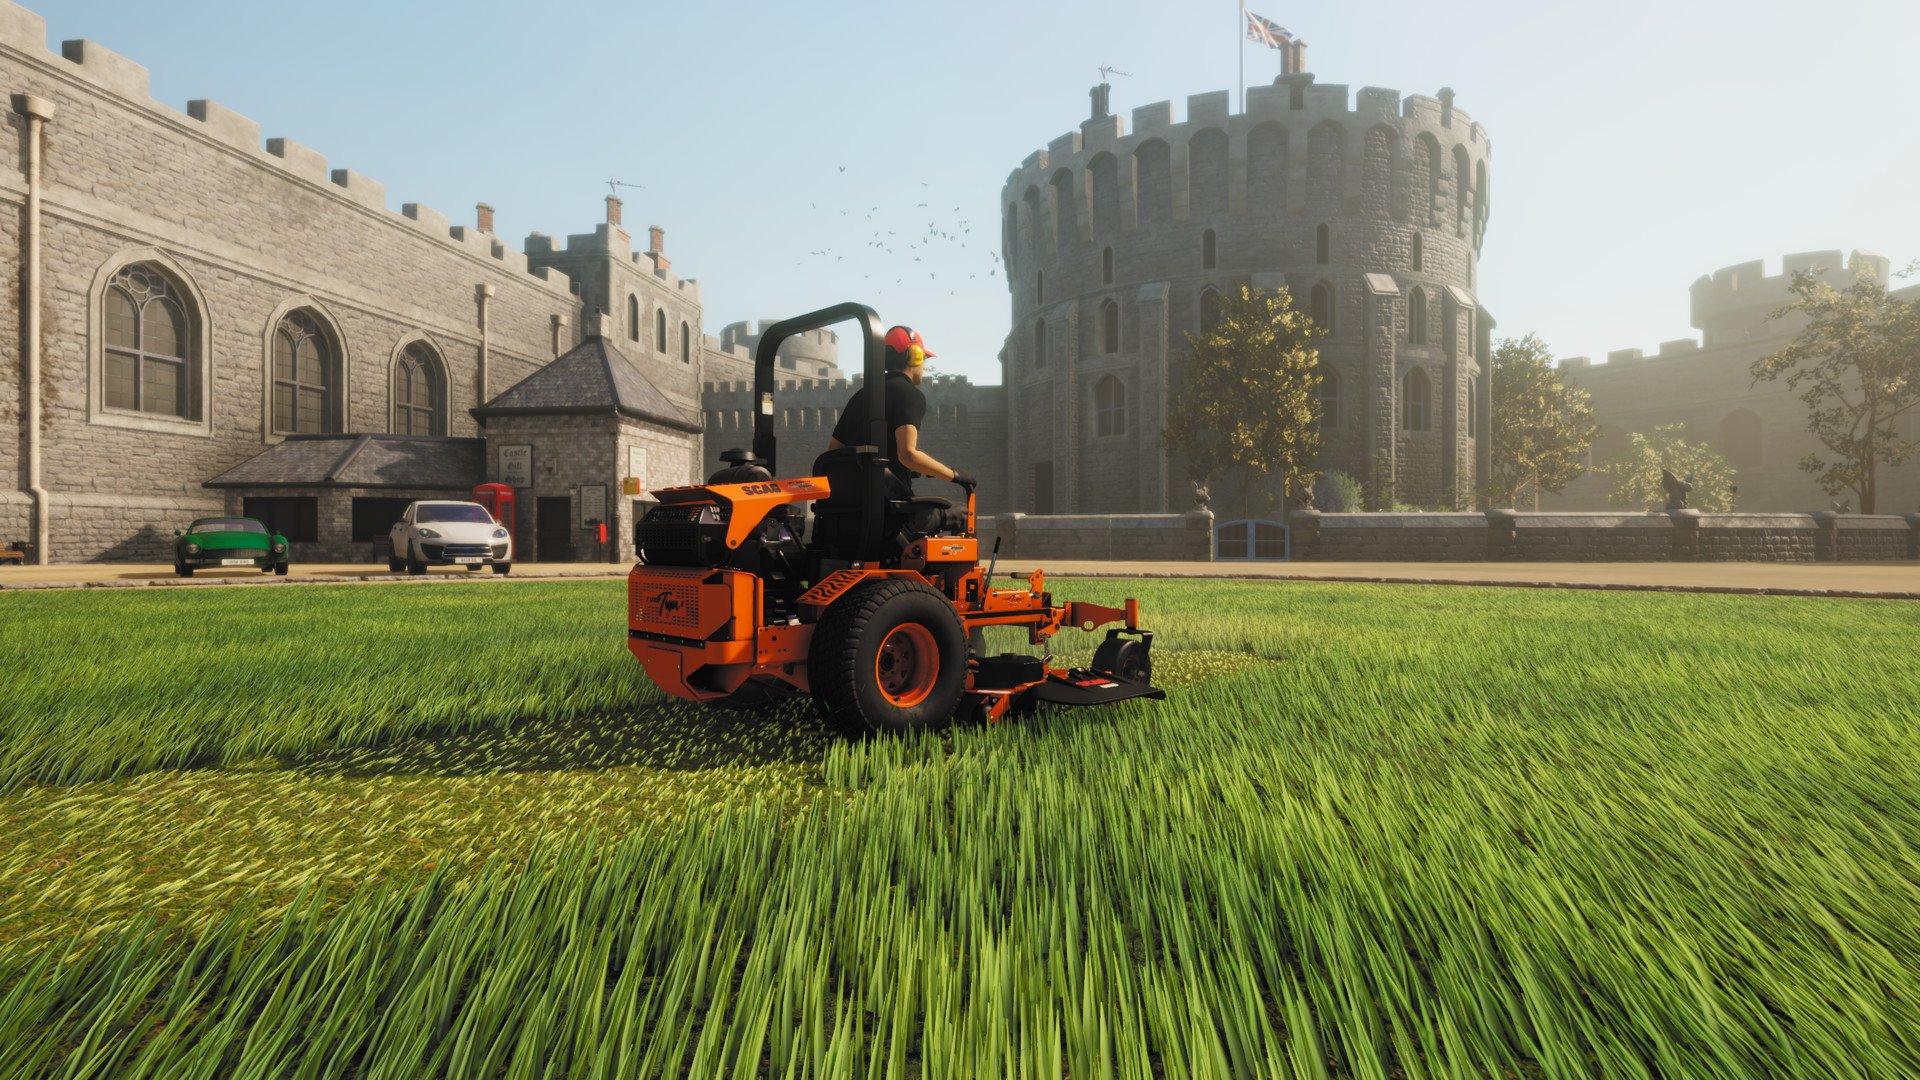 Lawn-Mowing-Simulator-Gameplay